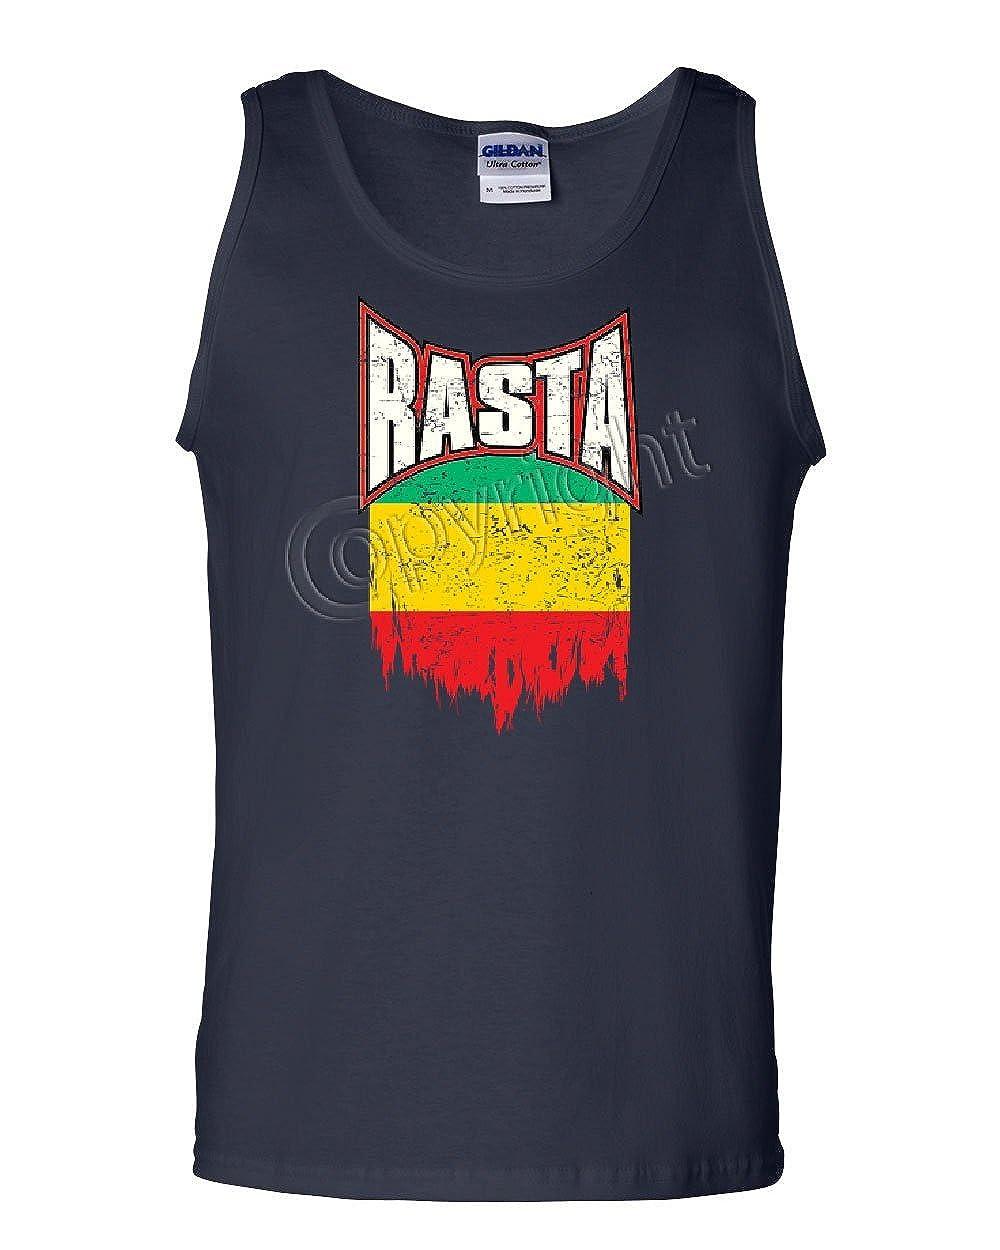 Tee Hunt Distressed Rasta Flag Tank Top Smoking 420 Reggae Marijuana Weed Sleeveless